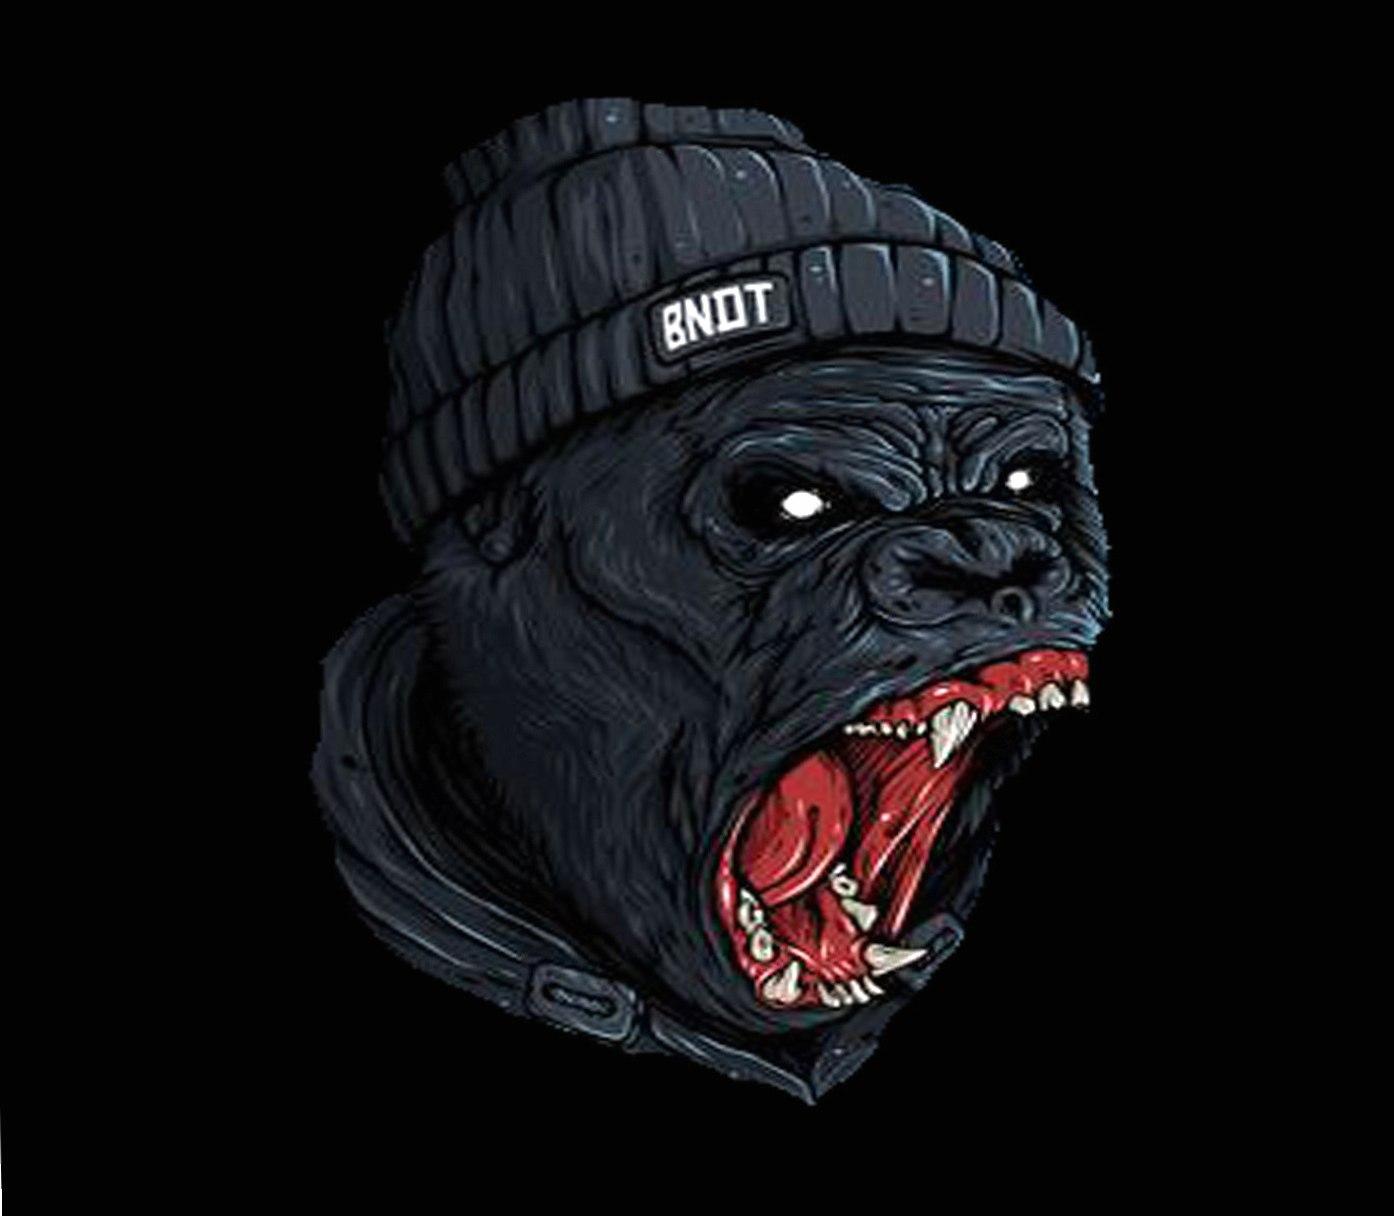 Bandit Headwear wallpapers HD quality